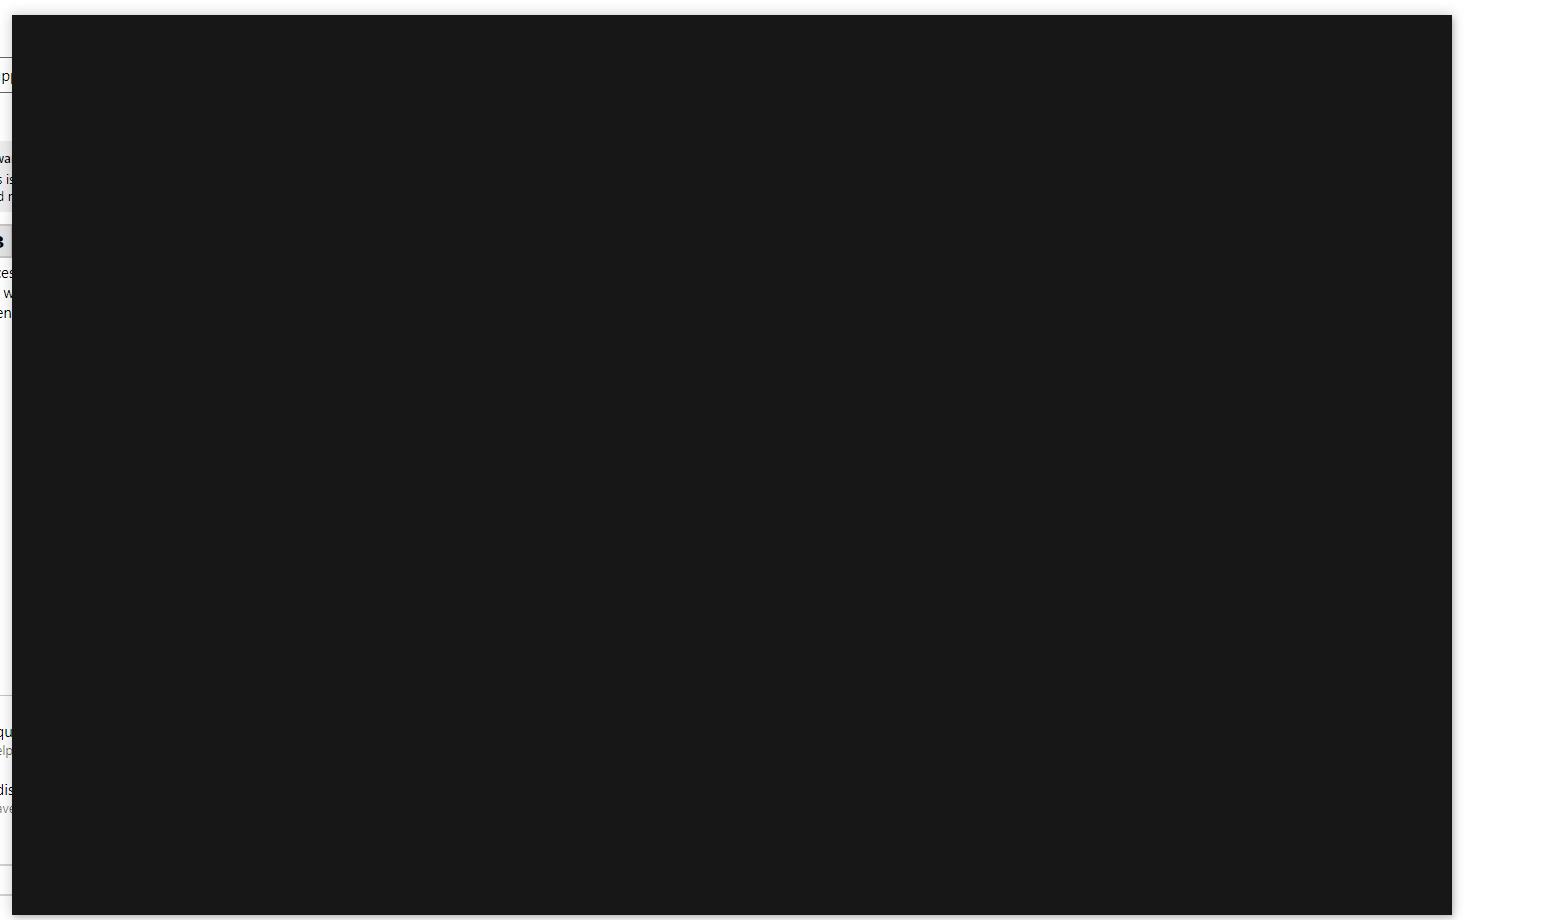 XBox PC app (beta) resulting in blank screen. [IMG]